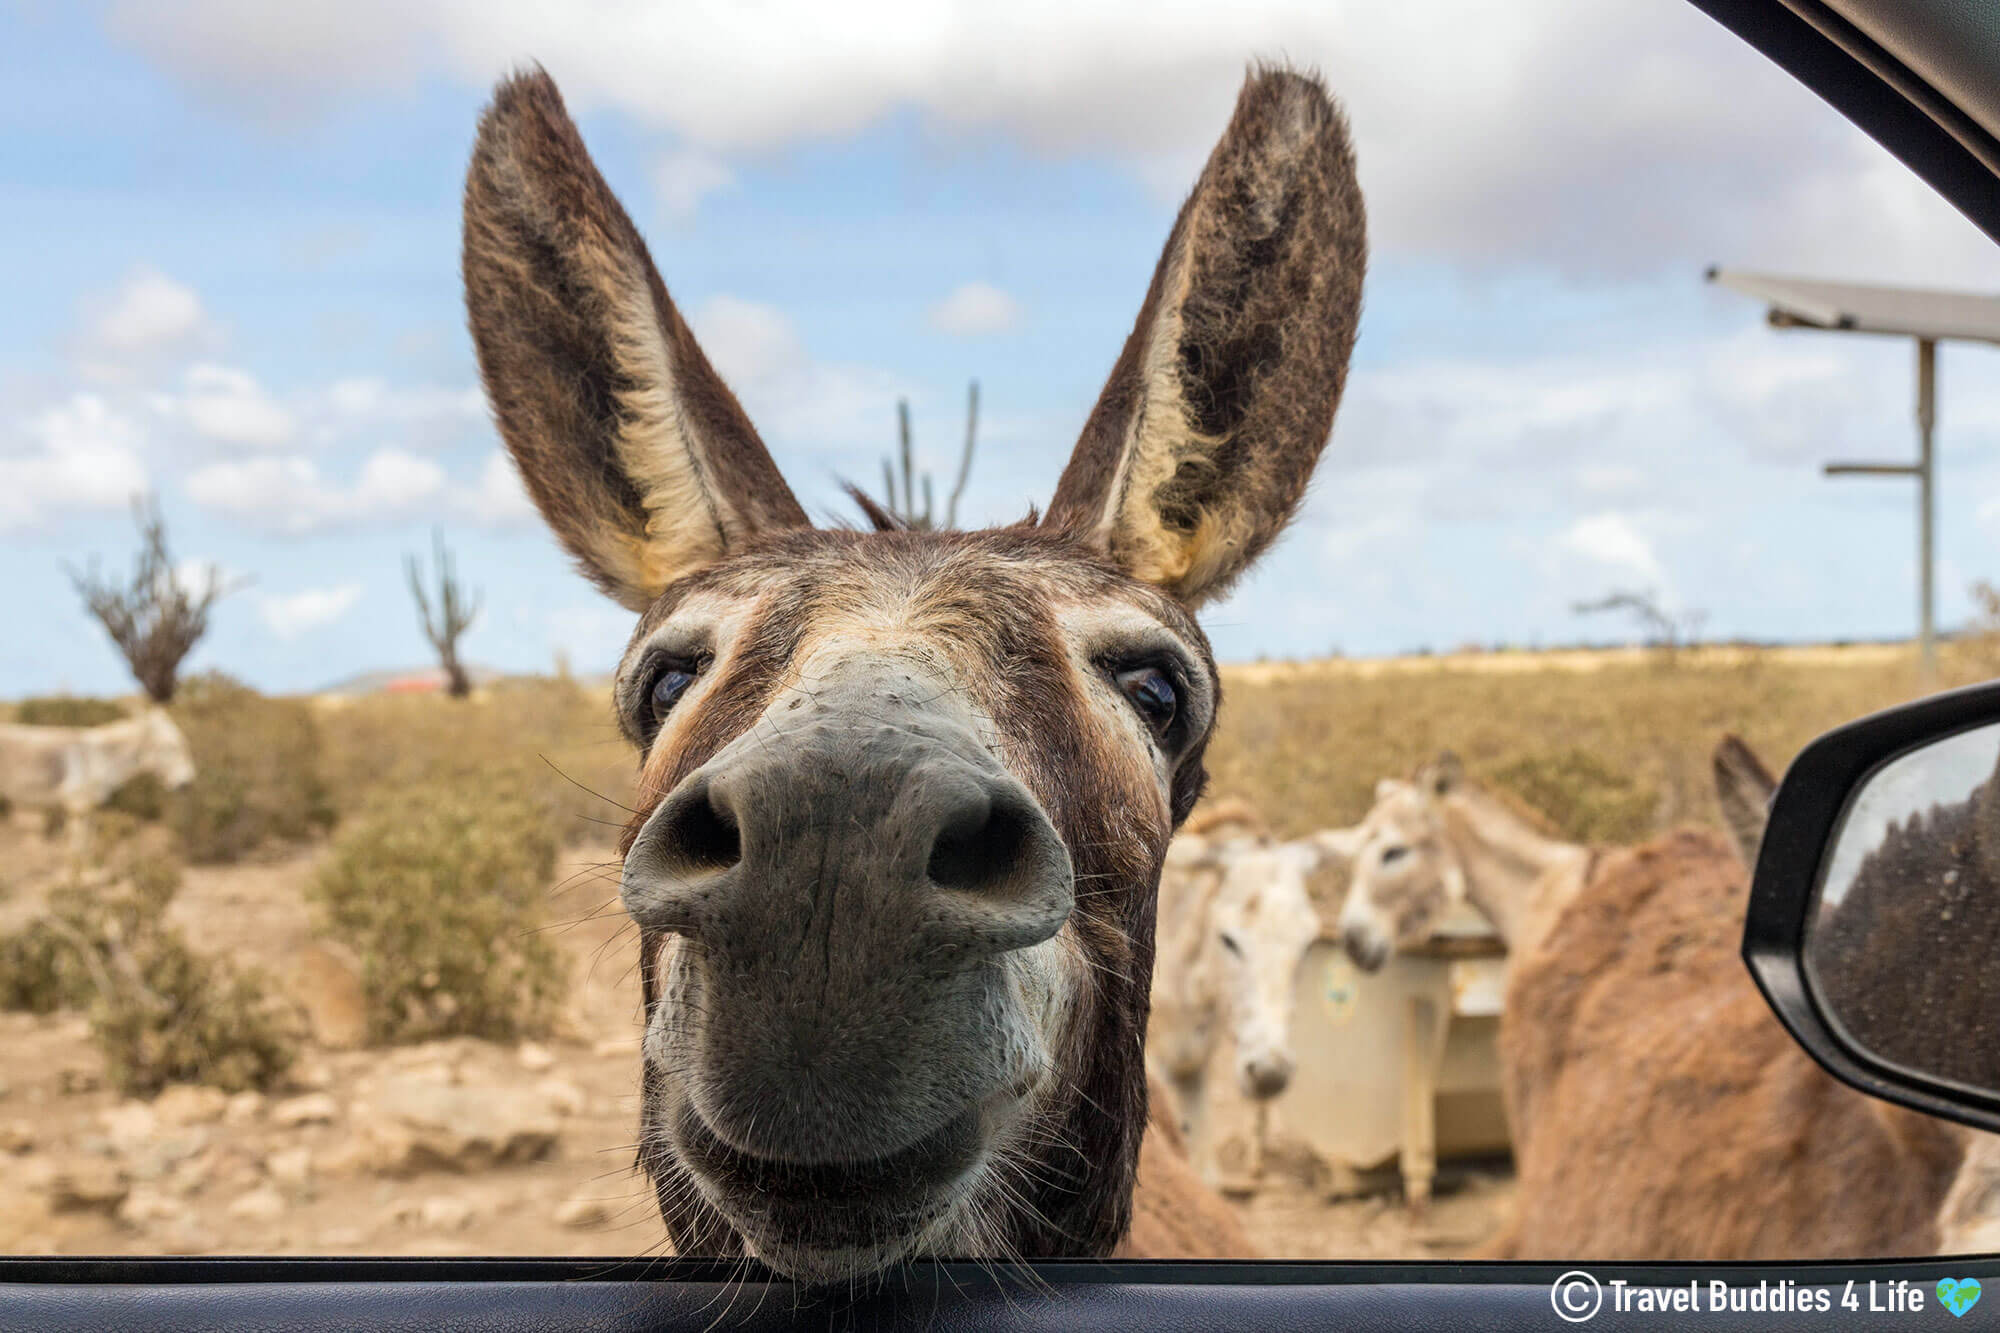 A Donkey Peeking Through The Car Window At The Bonaire Donkey Sanctuary, Dutch Caribbean